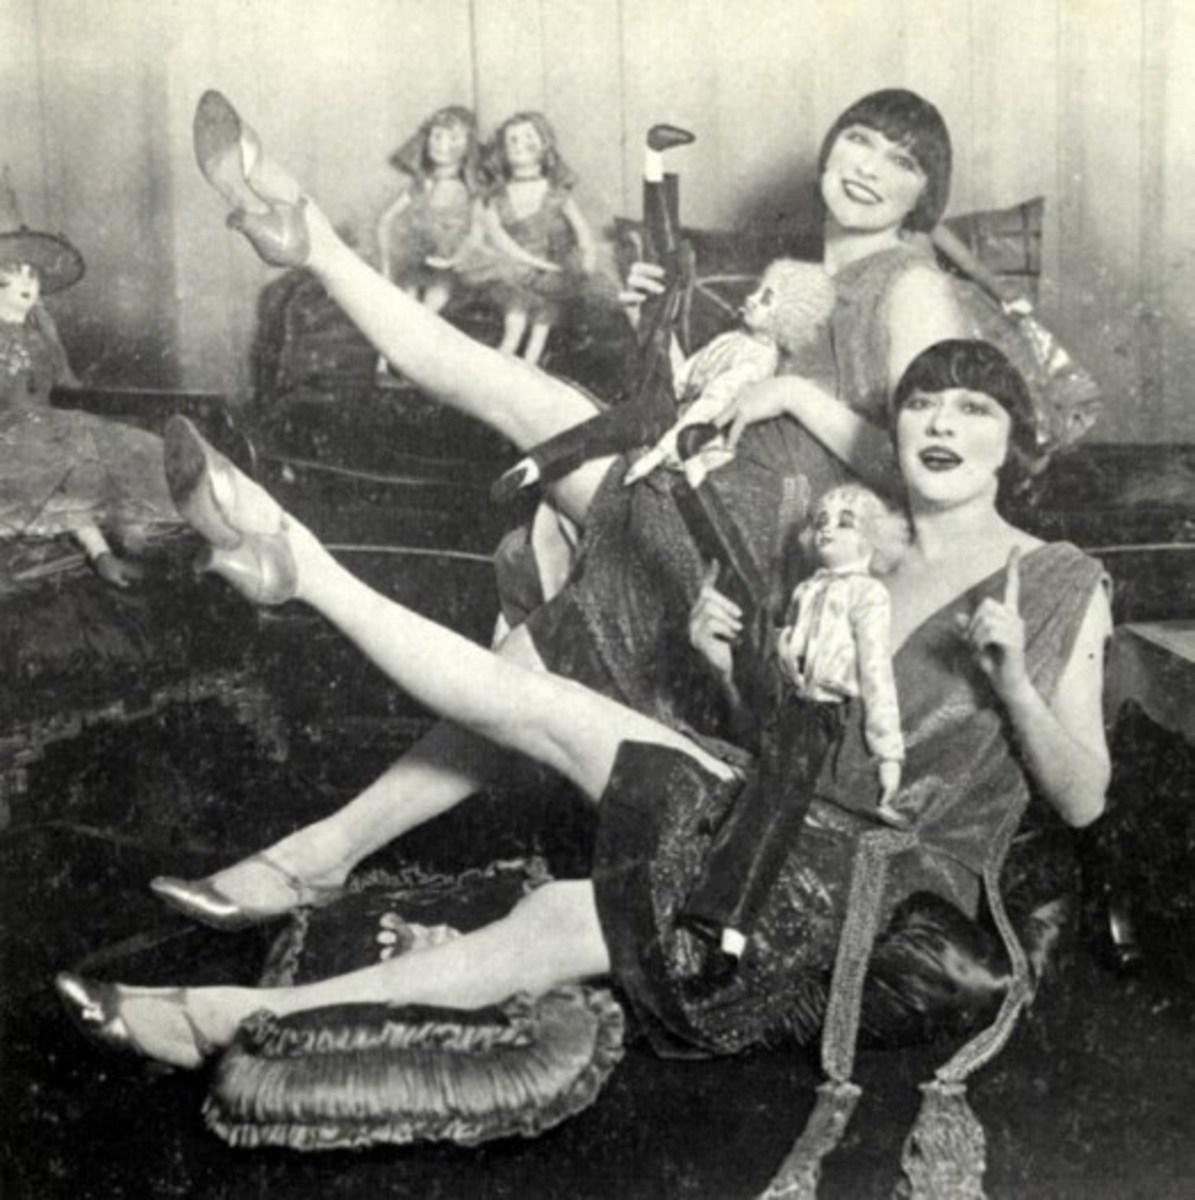 6 Duos of Vaudeville